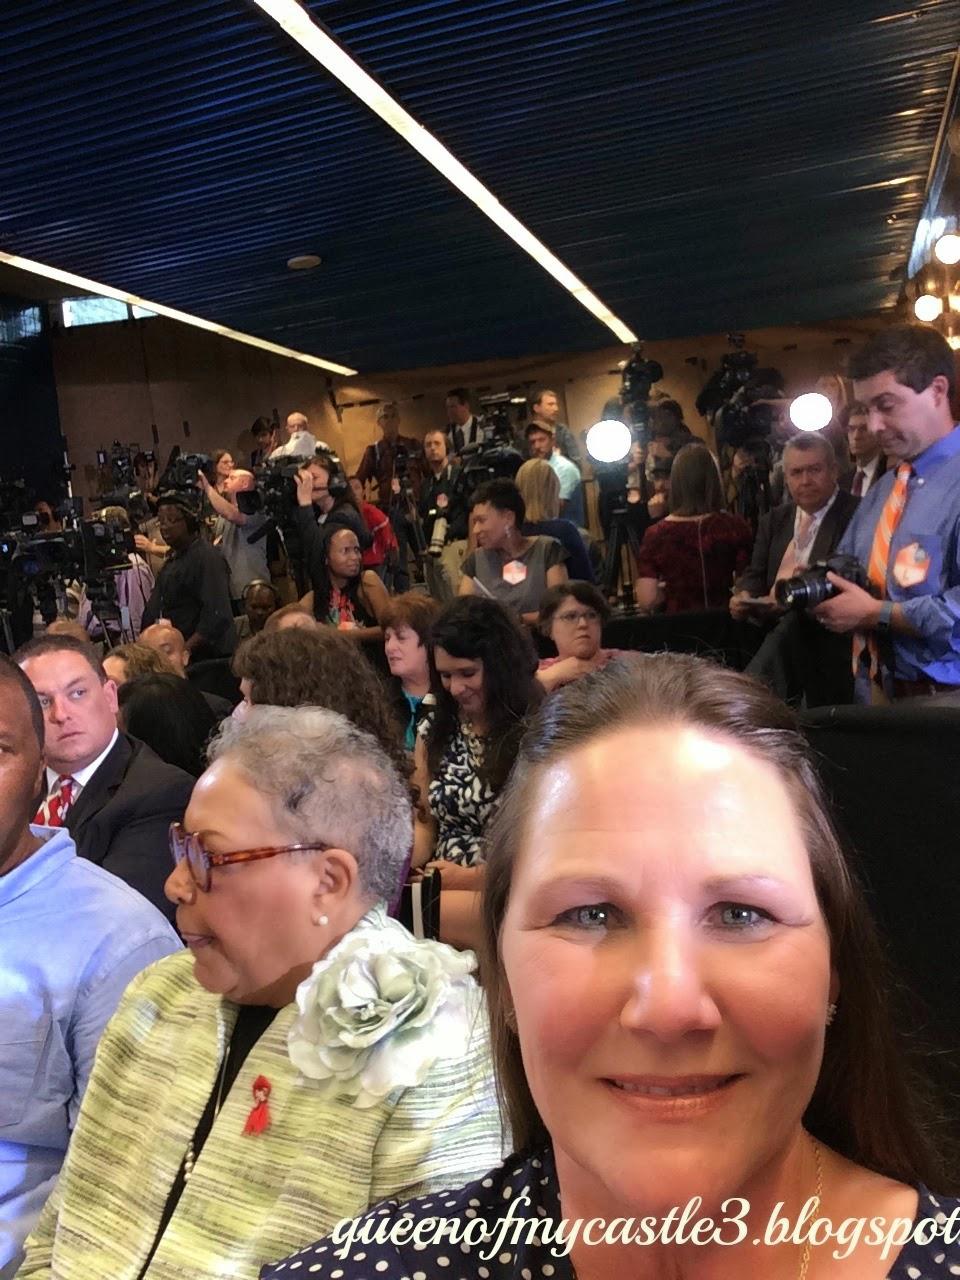 News Media waiting for Presidents arrival